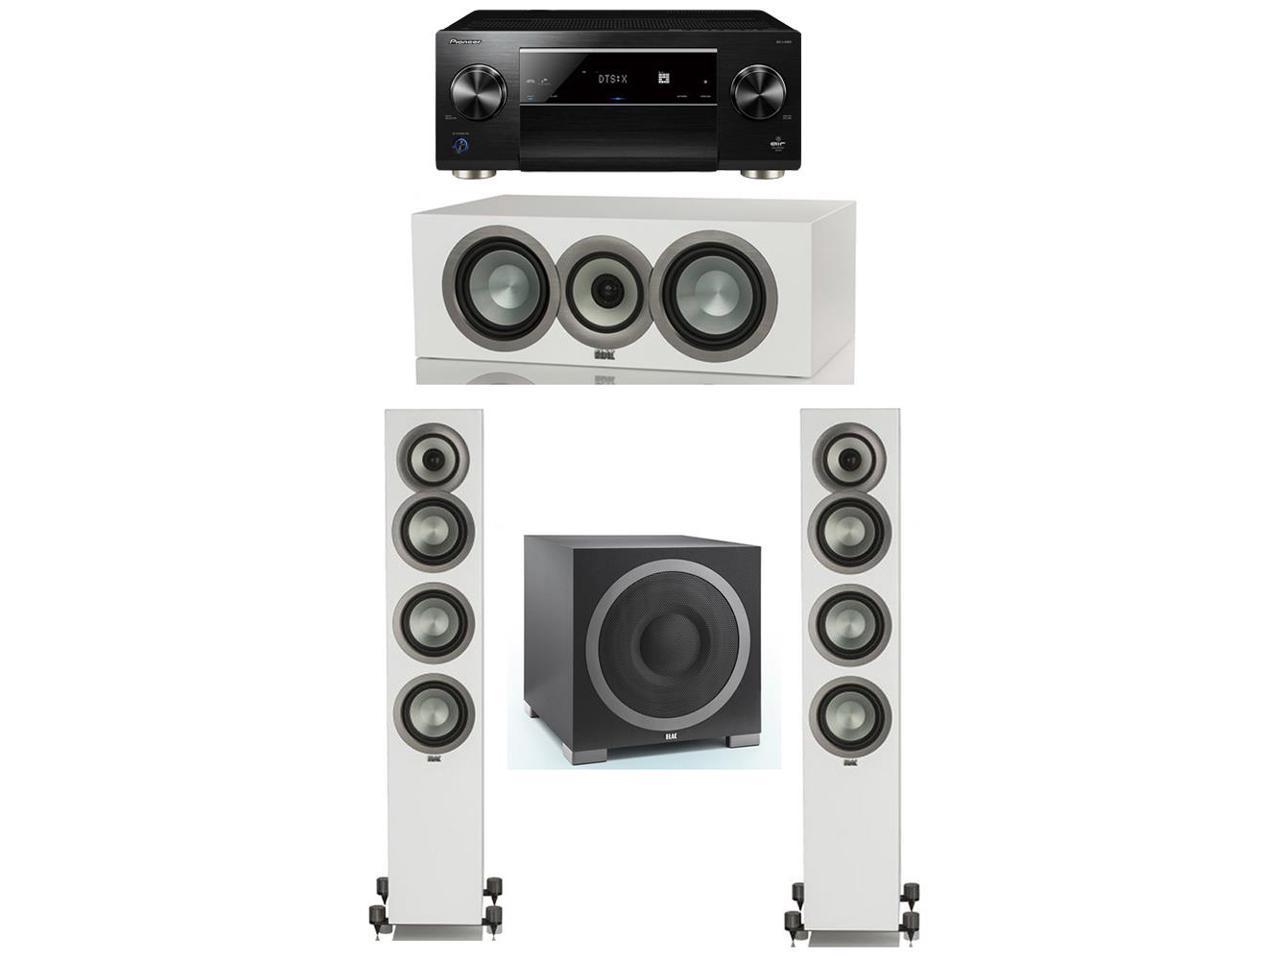 ELAC Uni-Fi Slim White 3.1 System with 2 FS-U5 Floorstanding Speakers, 1 ELAC CC-U5 Center Speaker, 1 ELAC Debut S12EQ Powered Subwoofer, 1 Pioneer SC-LX901 A/V receiver